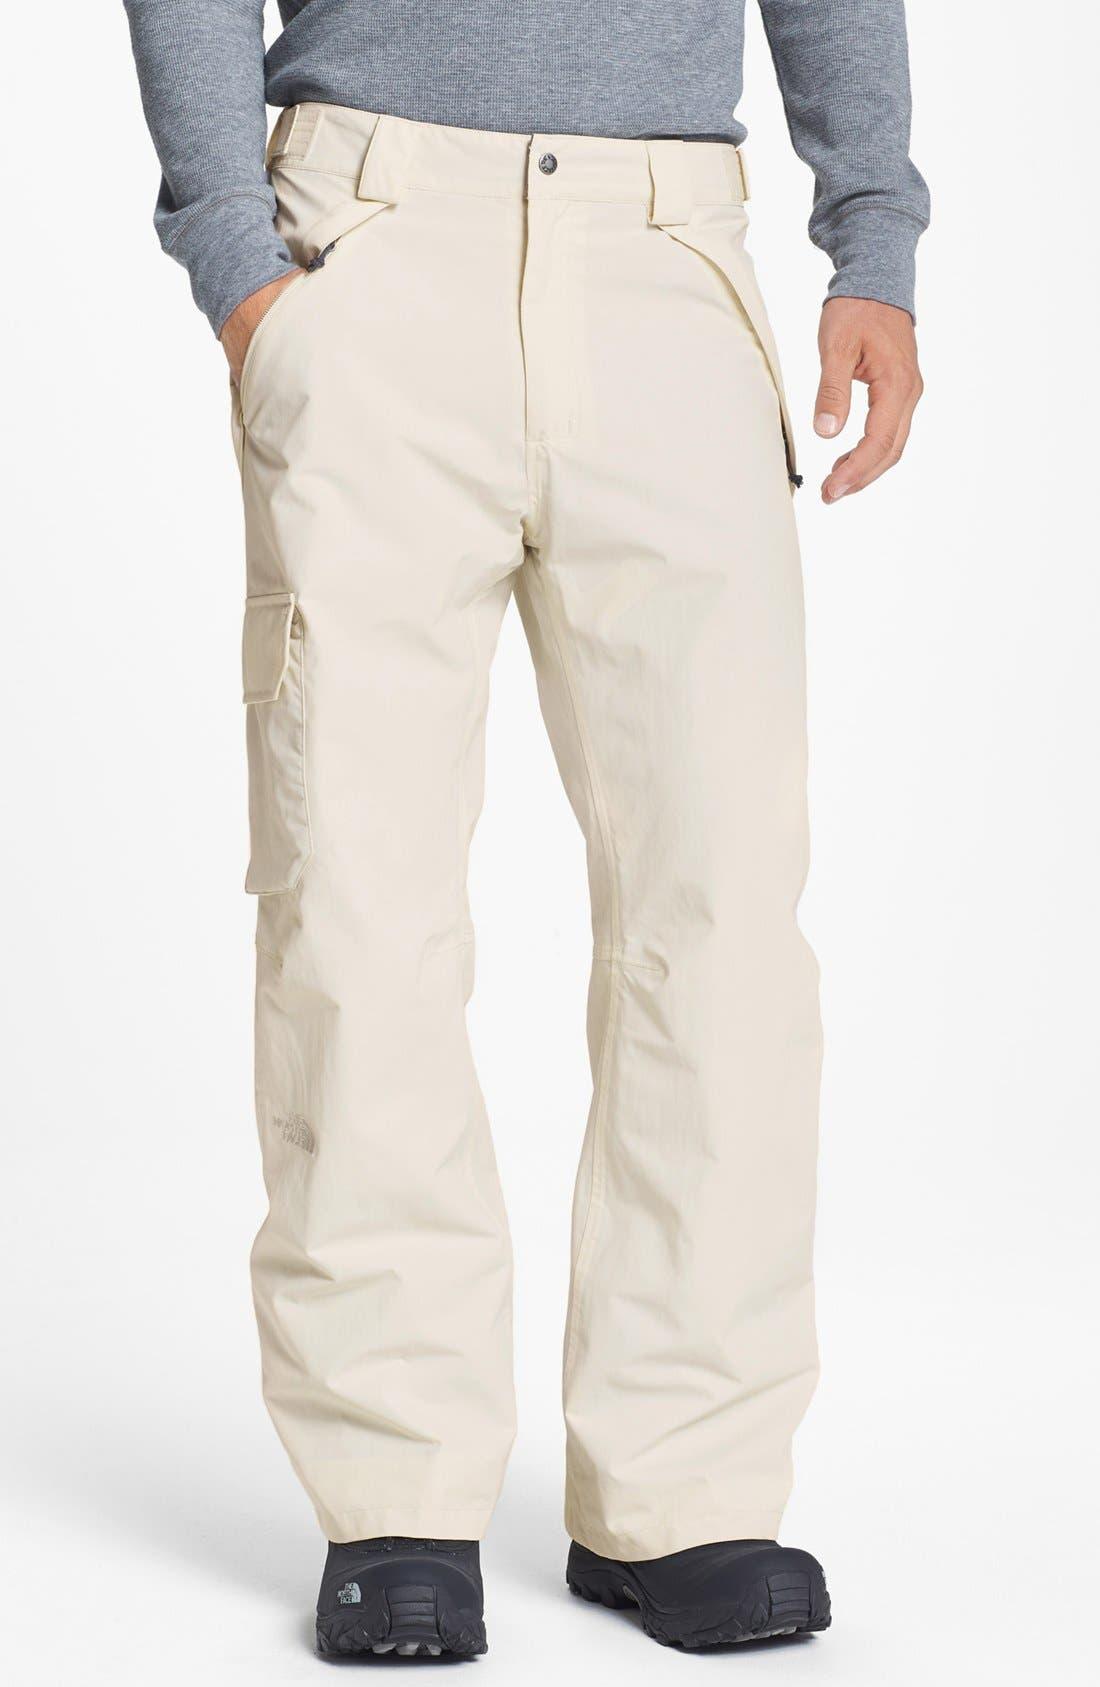 Main Image - The North Face 'Seymore' Ski Pants